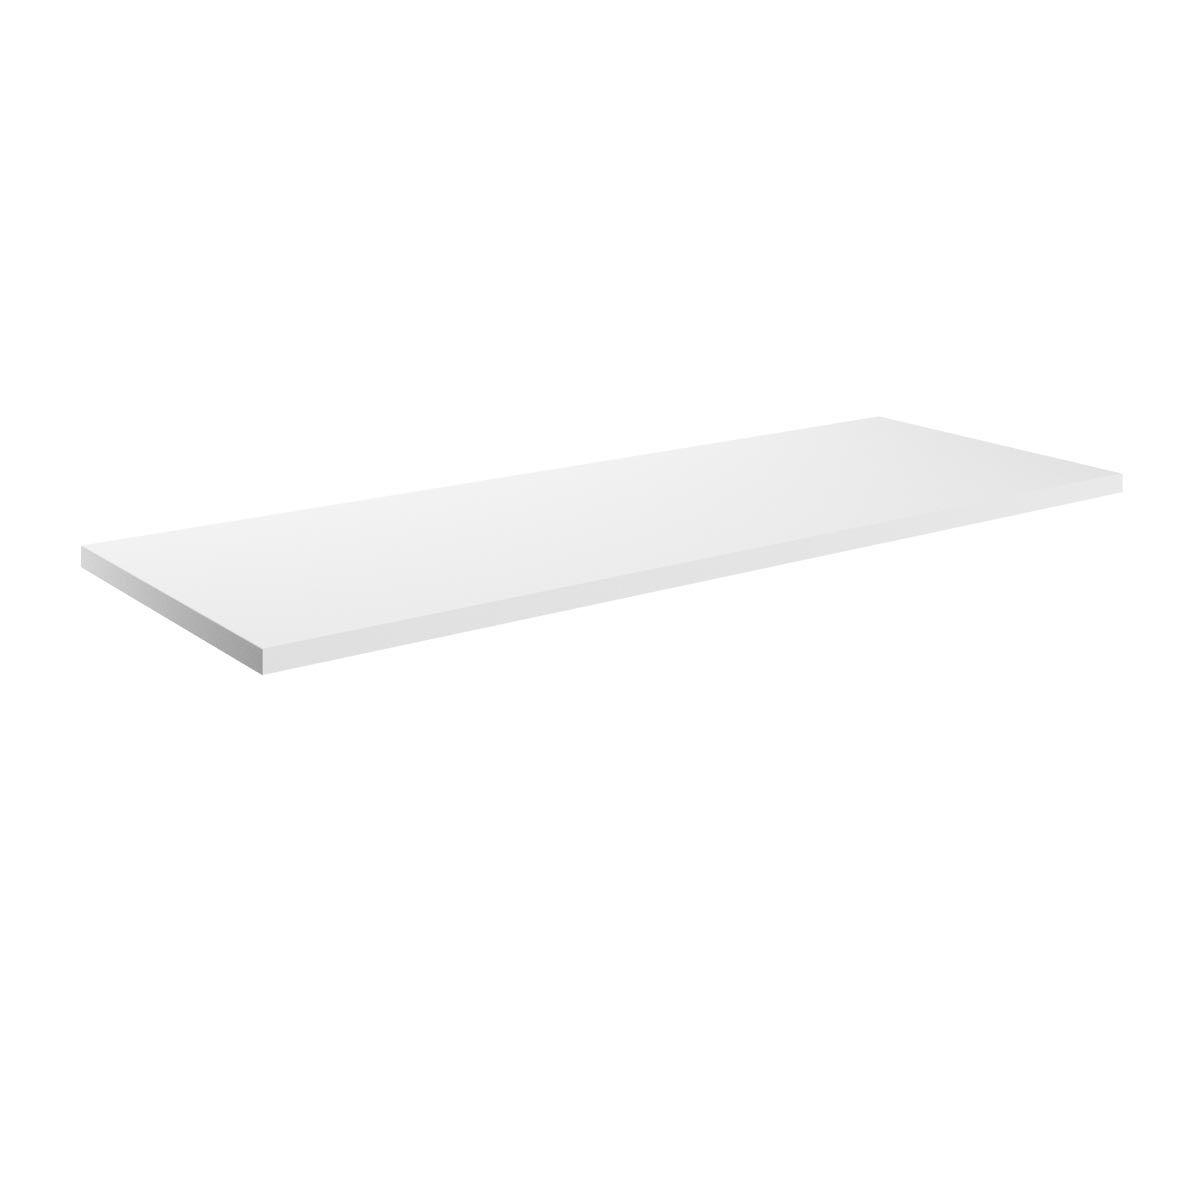 BTL Morina White Gloss Countertop 1200mm